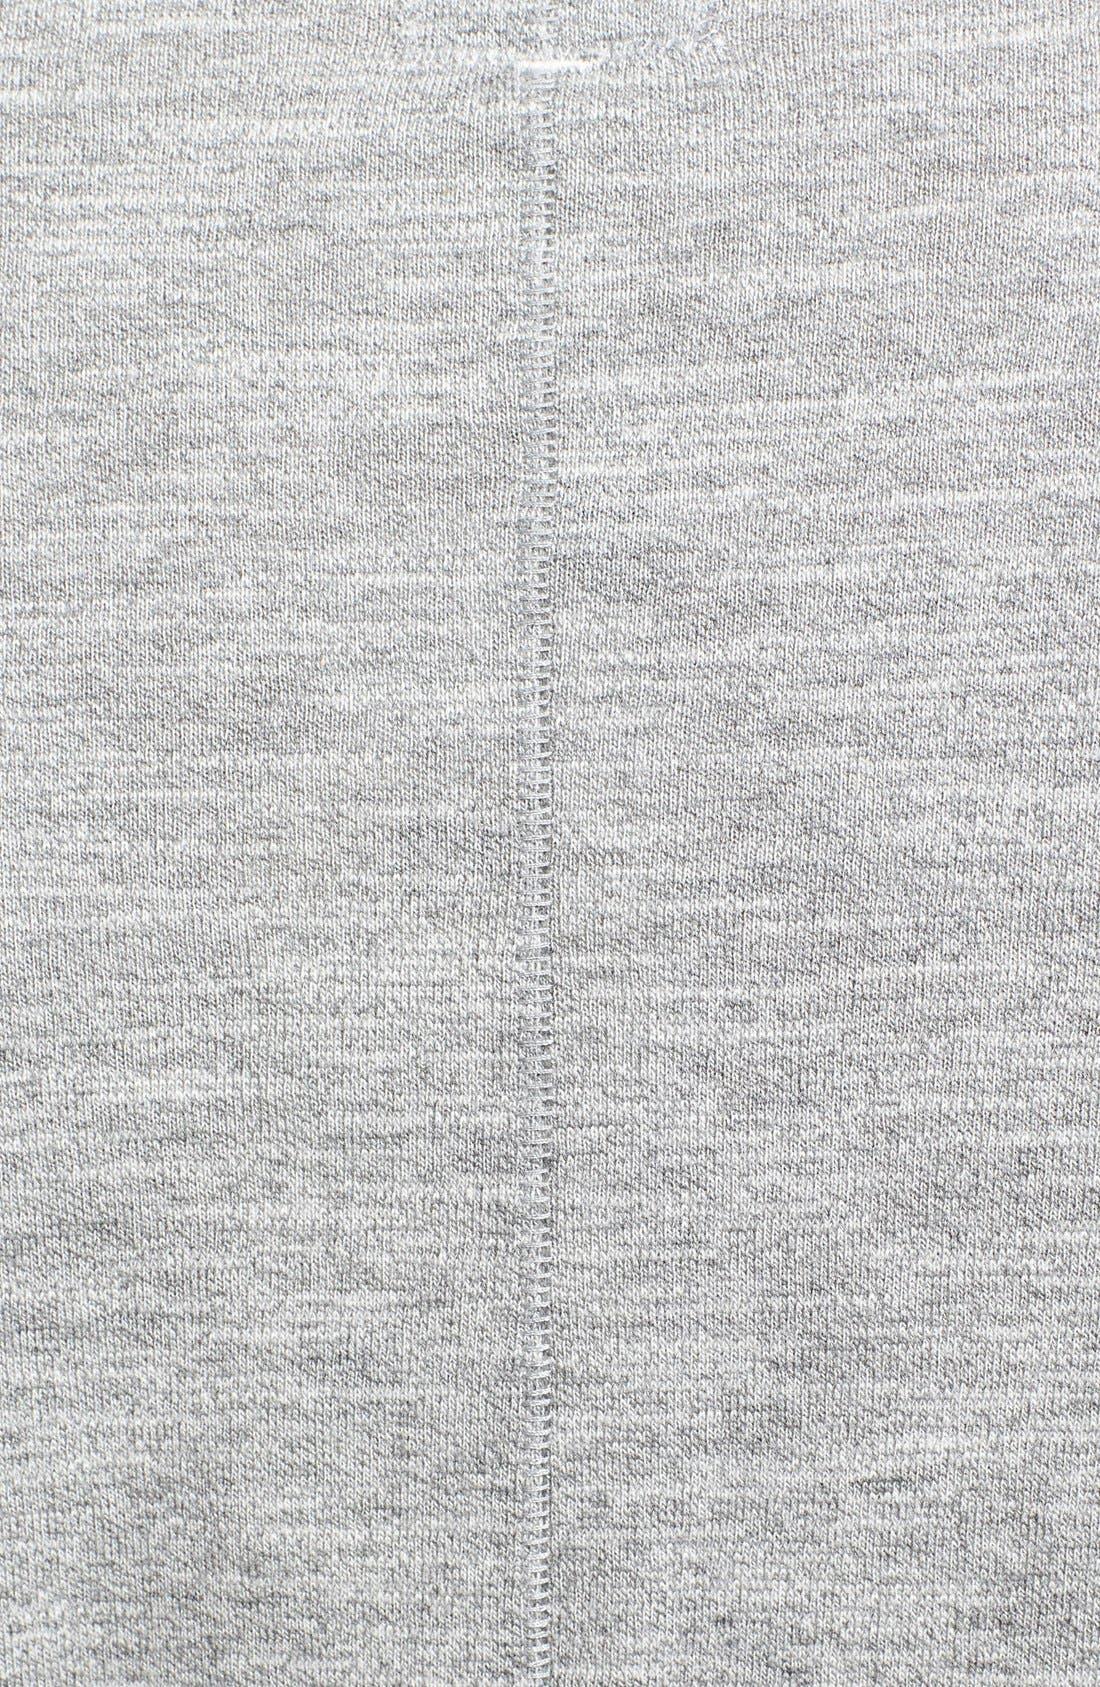 Alternate Image 3  - rag & bone Standard Issue 'Moulinex' Crewneck T-Shirt